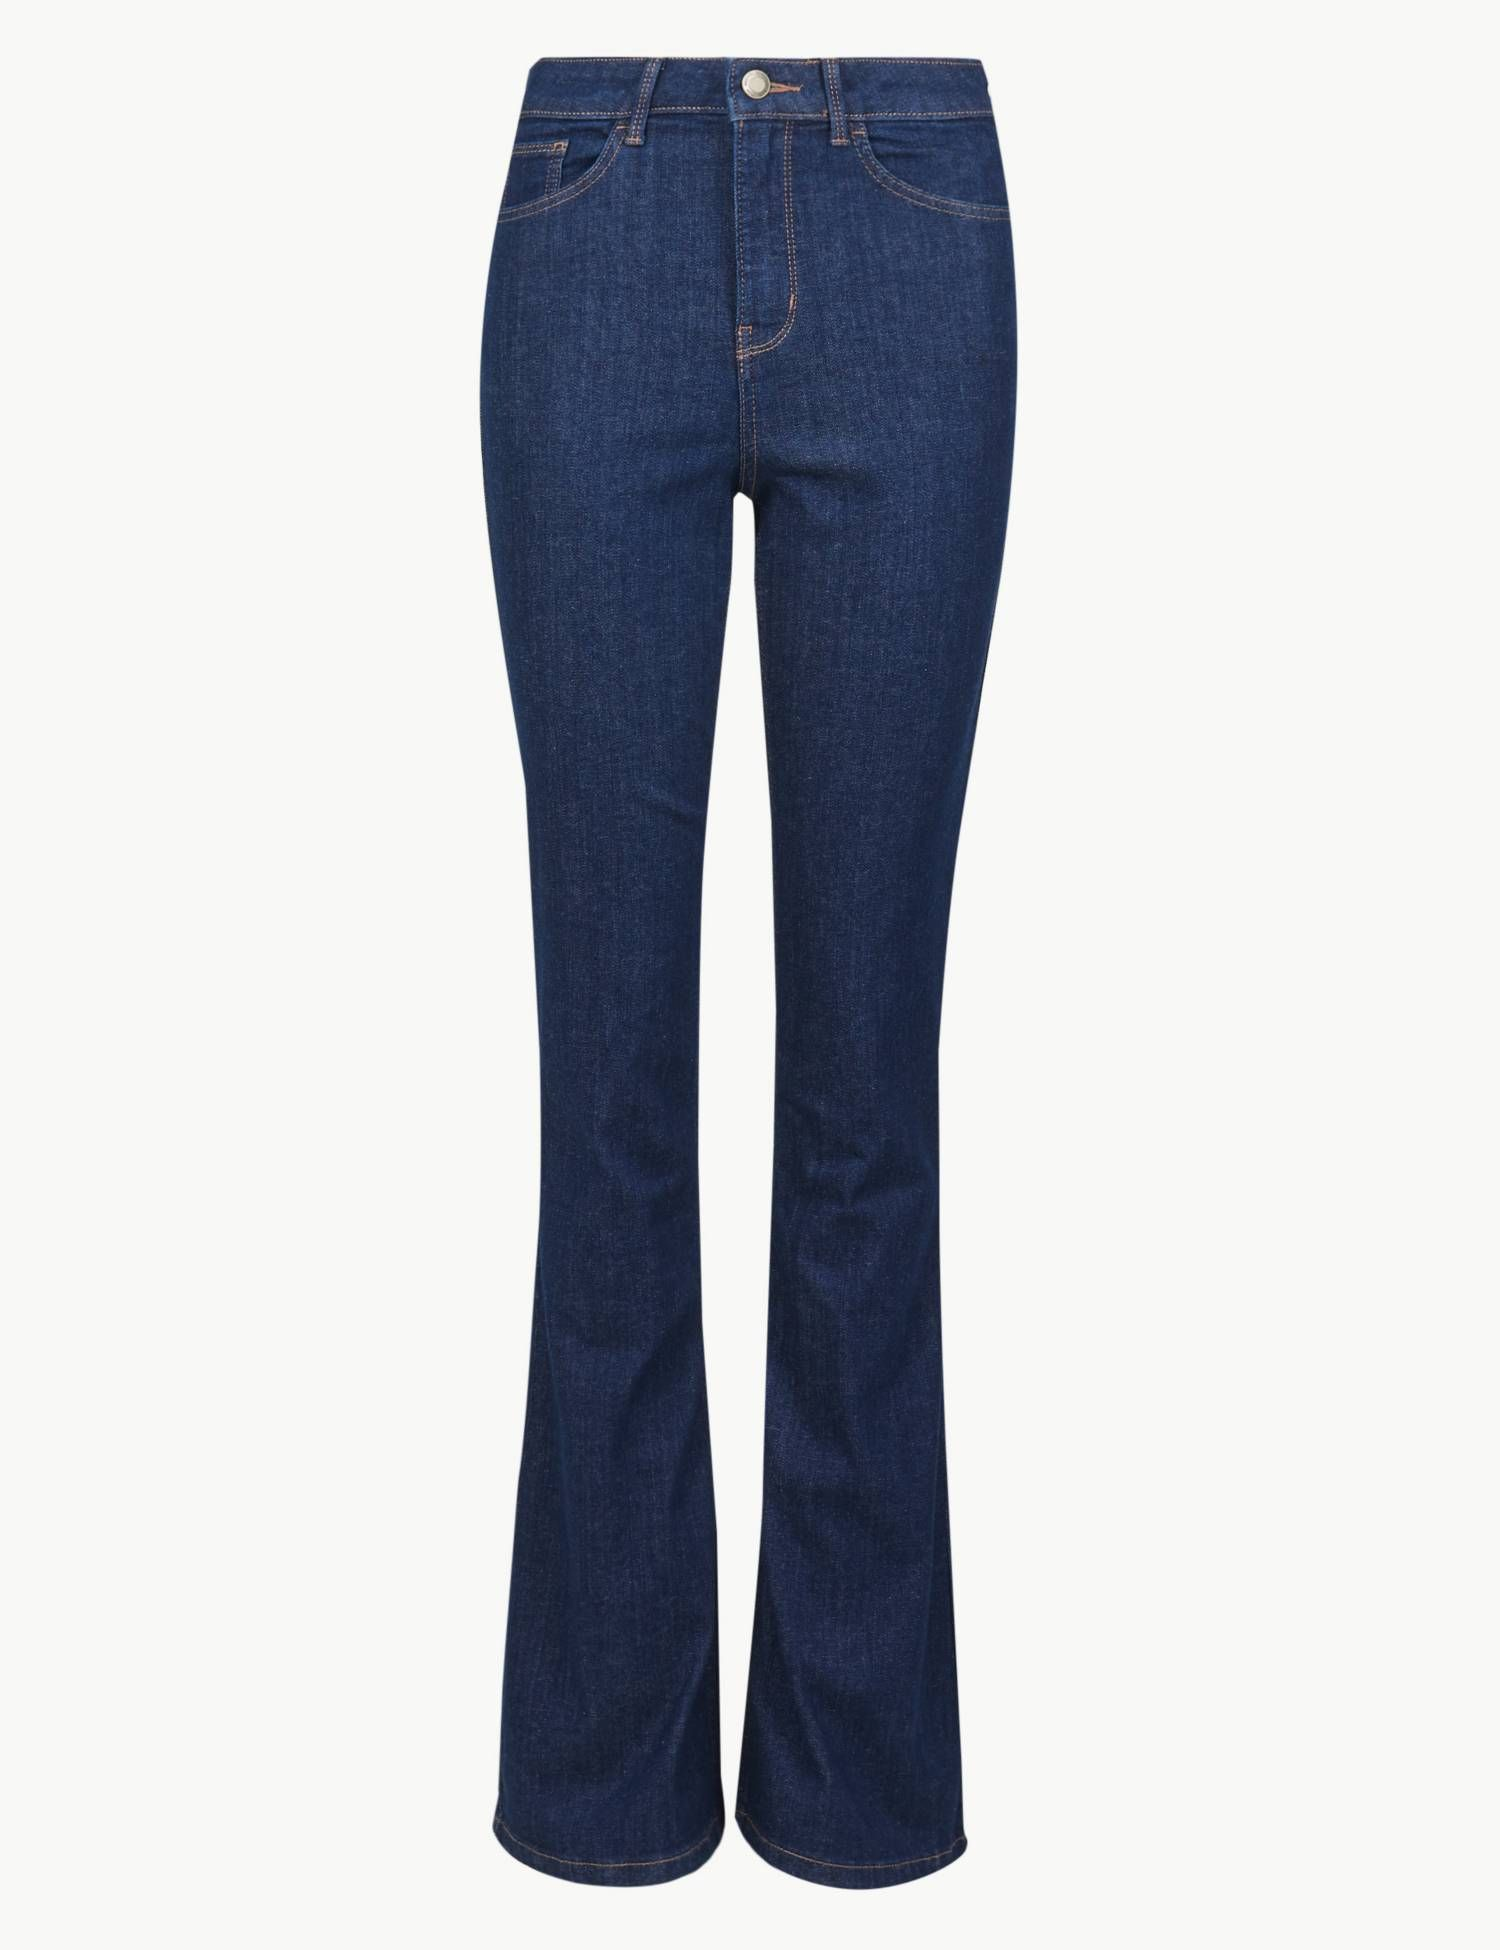 marks & spencer denim jeans